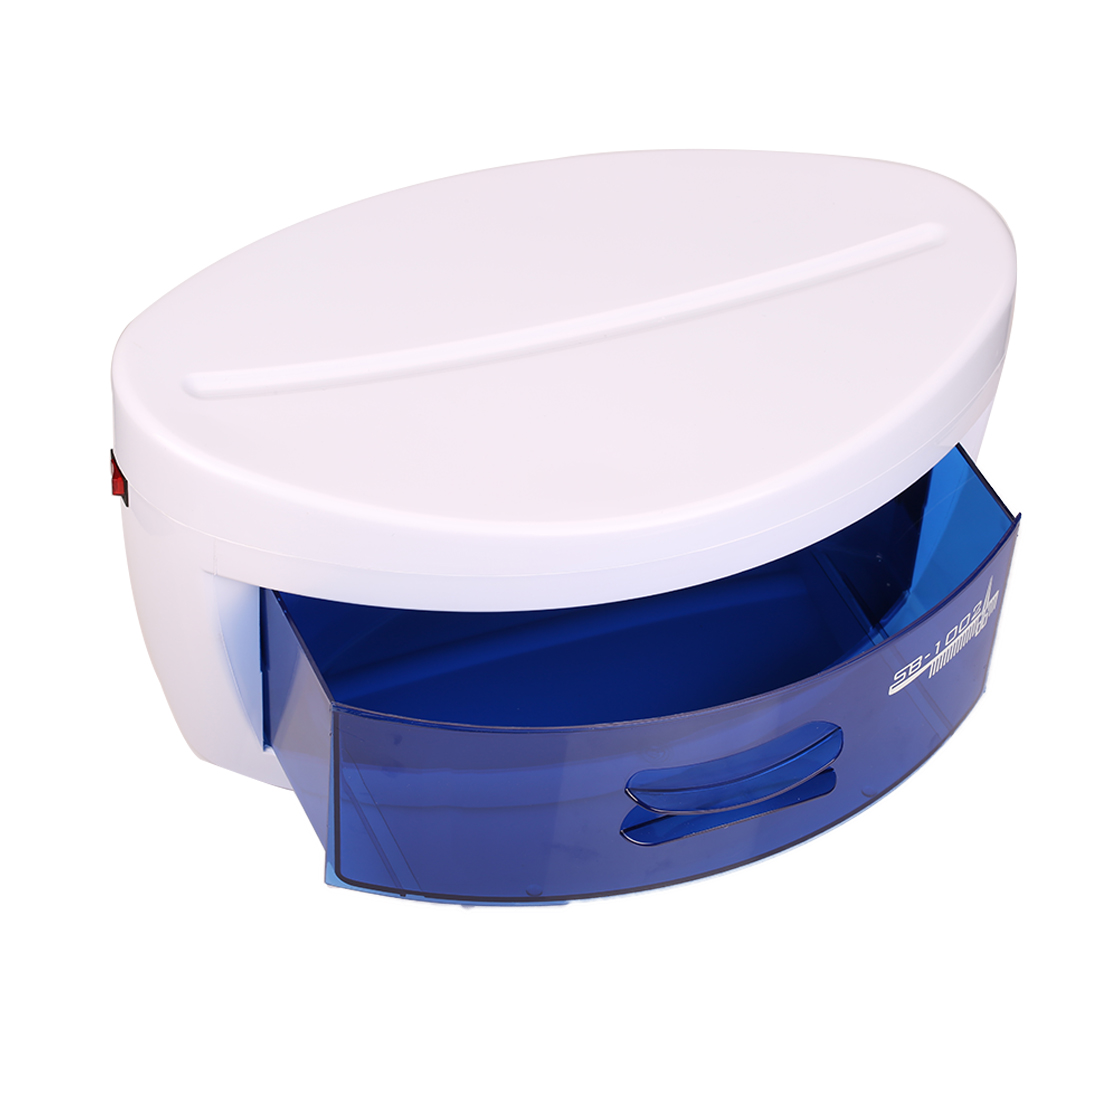 Tools Sterilizer Professional Nail Sterilizer Box Nail Art Salon Portable UV Sterilizing Tool Beauty Esterilizador Manicure<br>